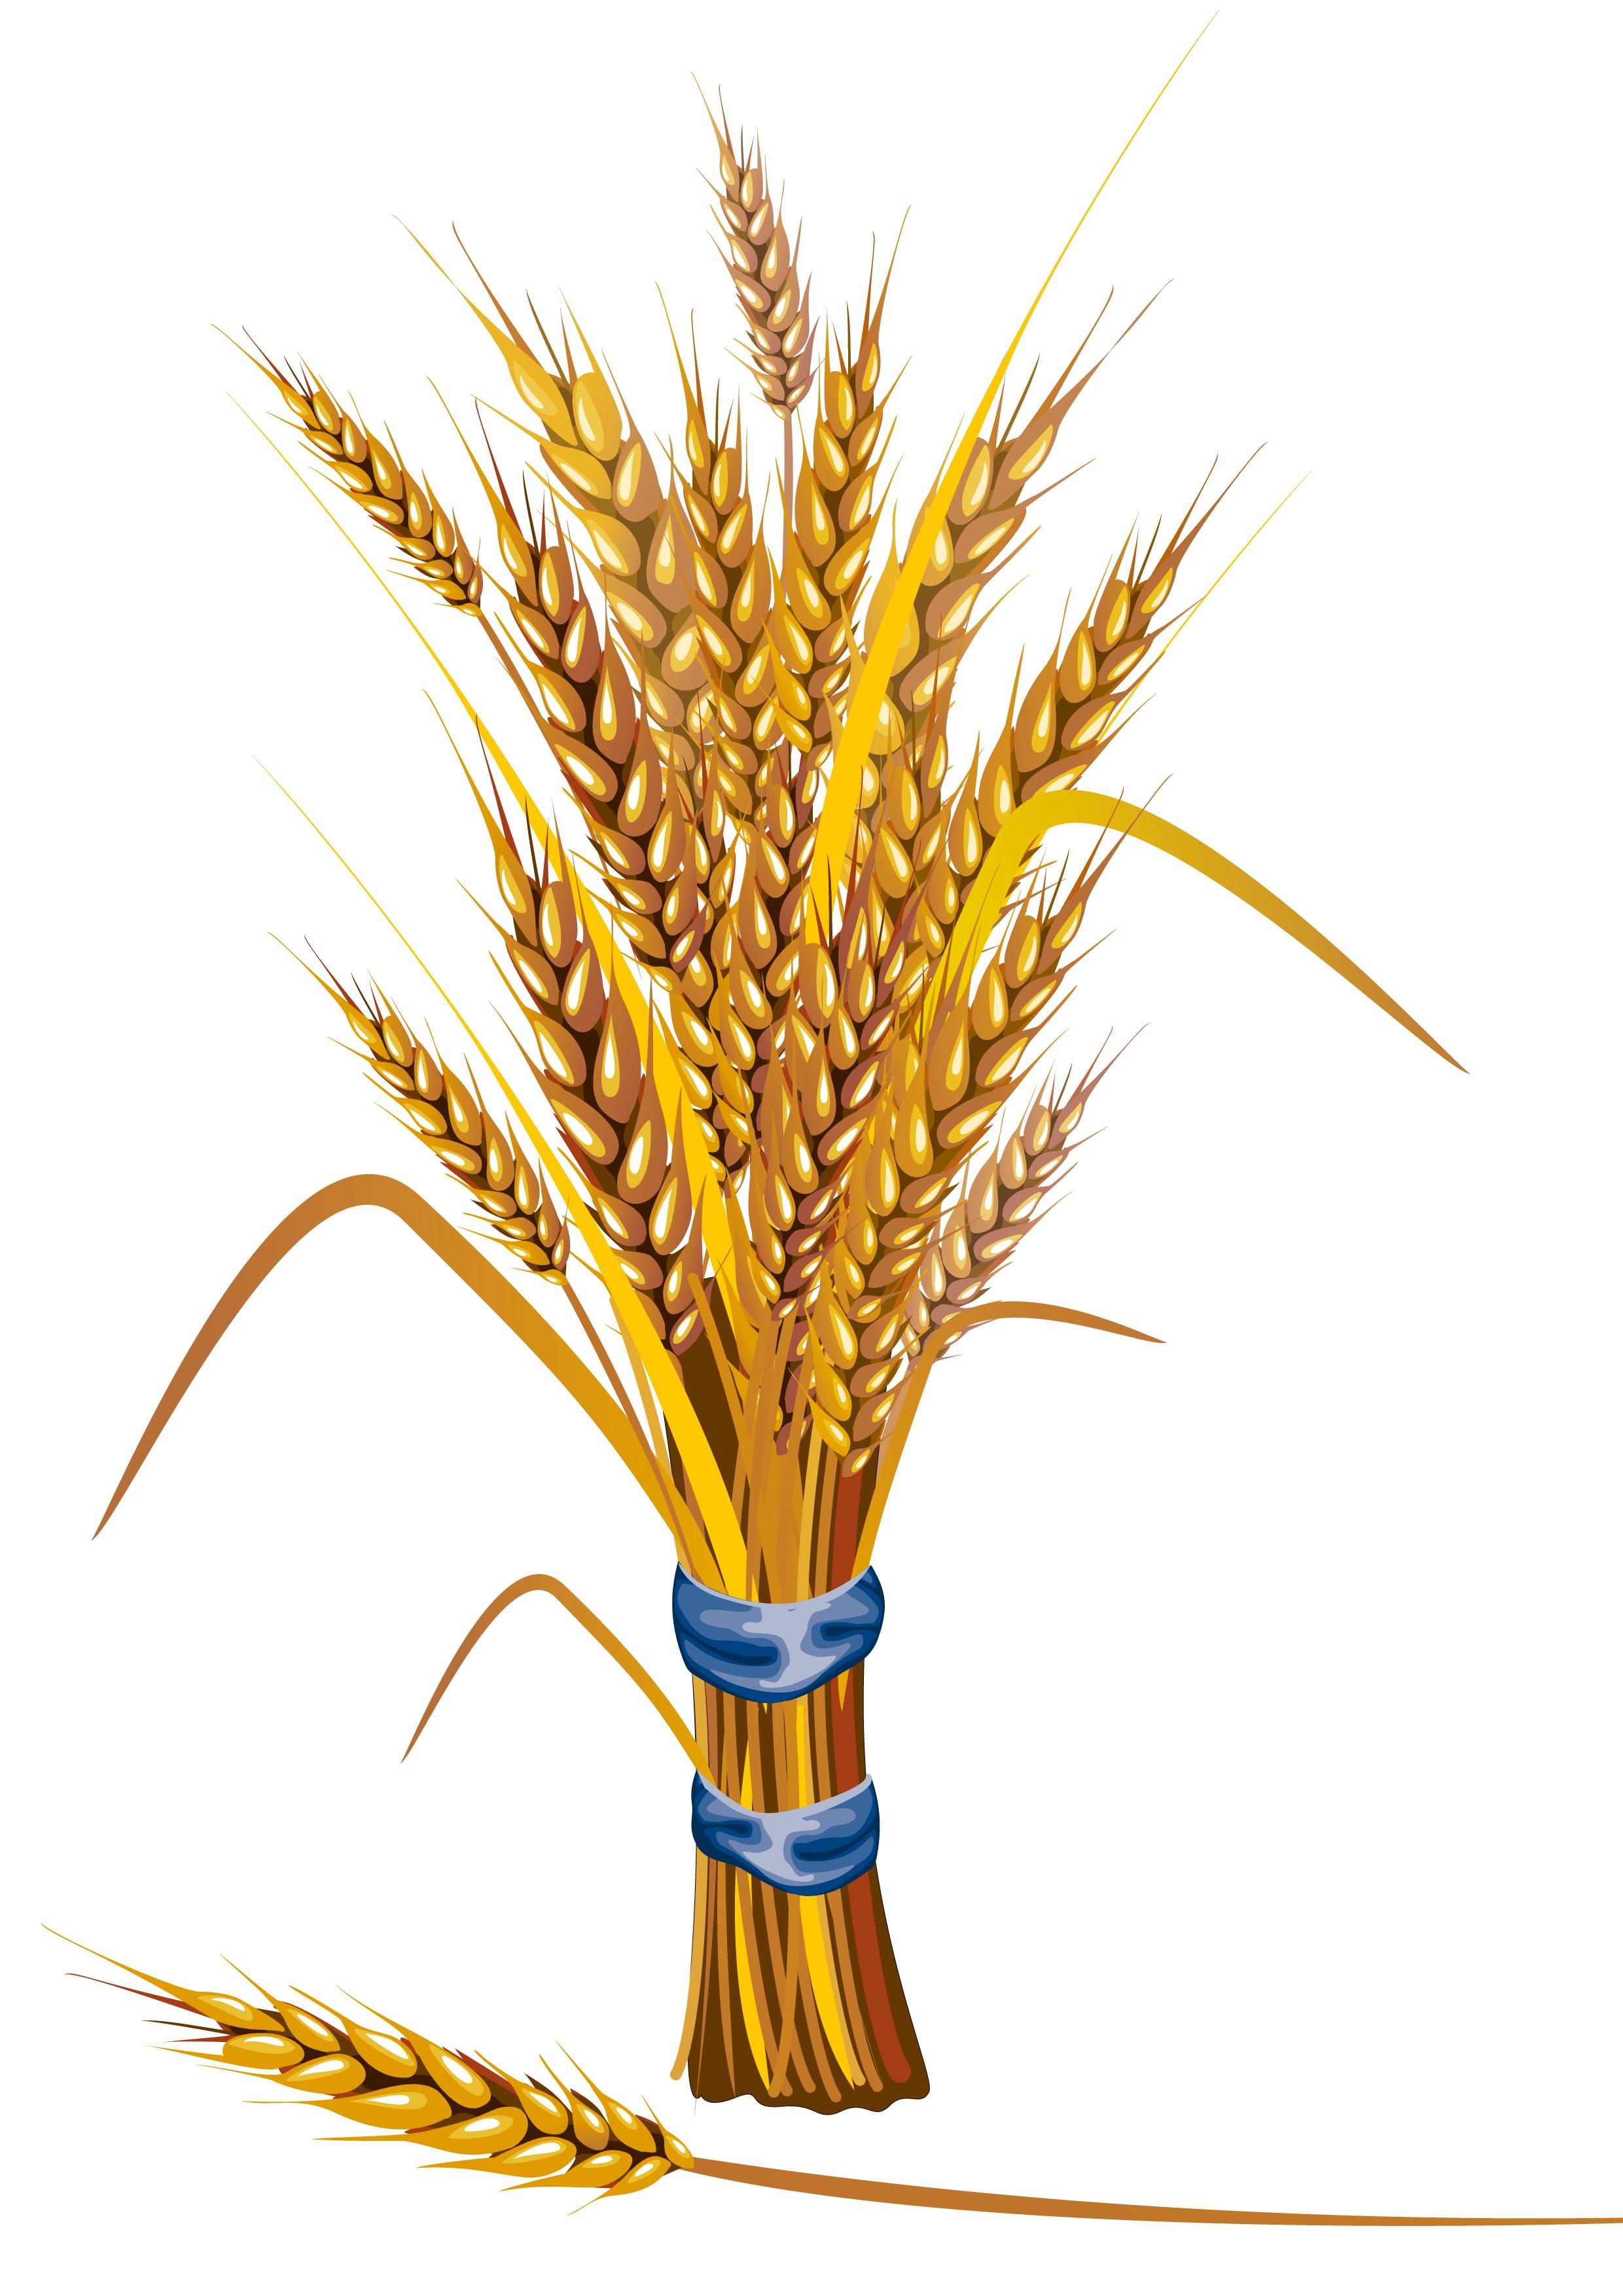 Wheat PNG Image Modern card design, Wheat, Illustration